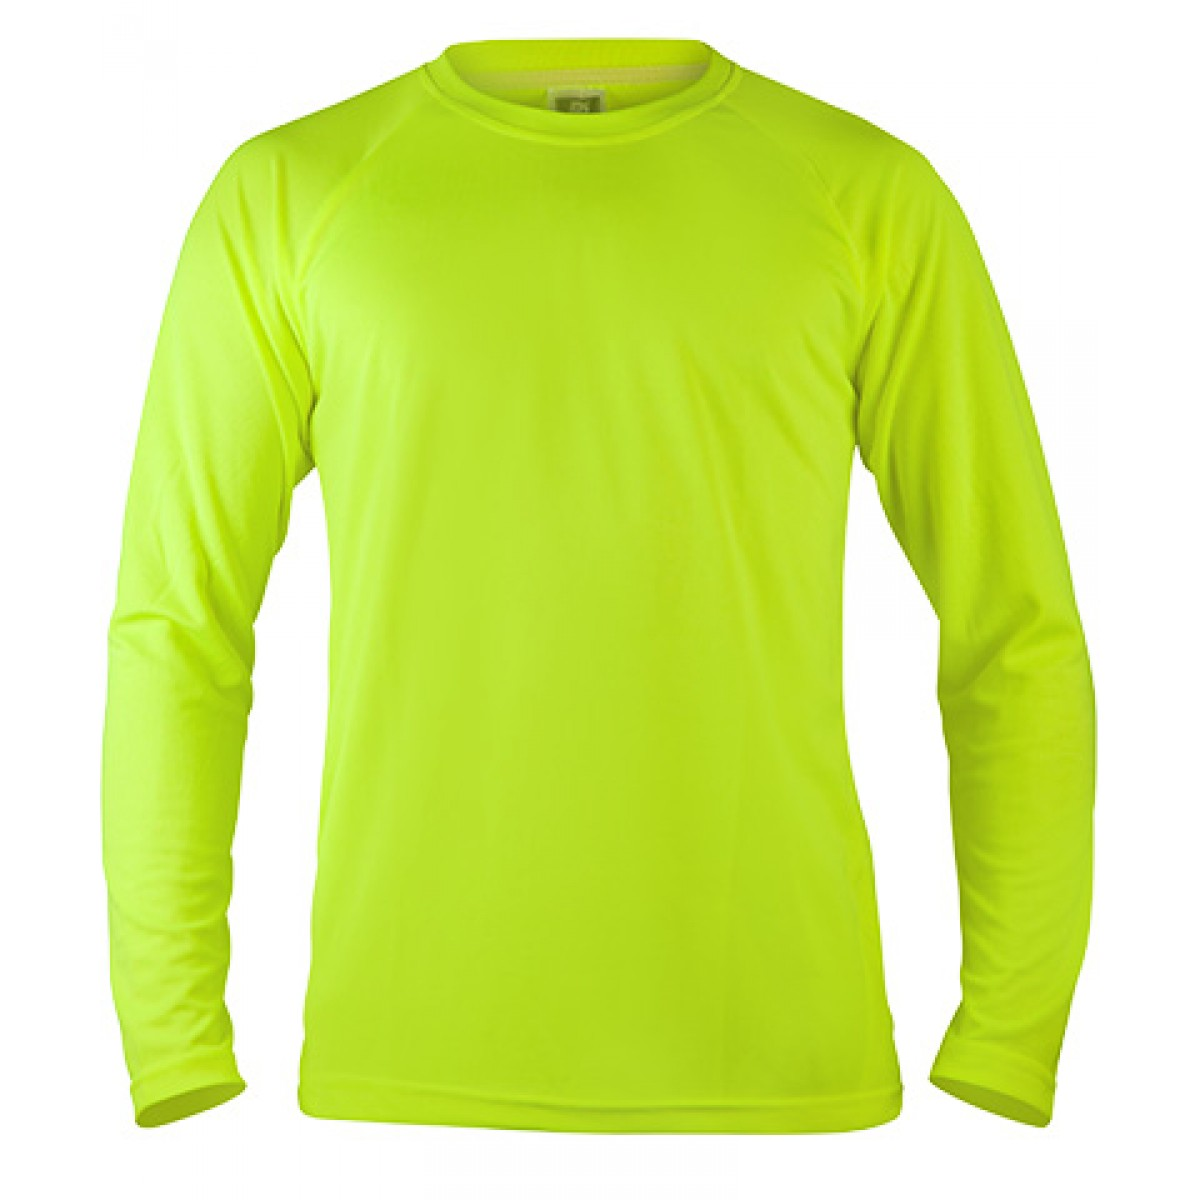 Long Sleeve Mesh Performance T-shirt